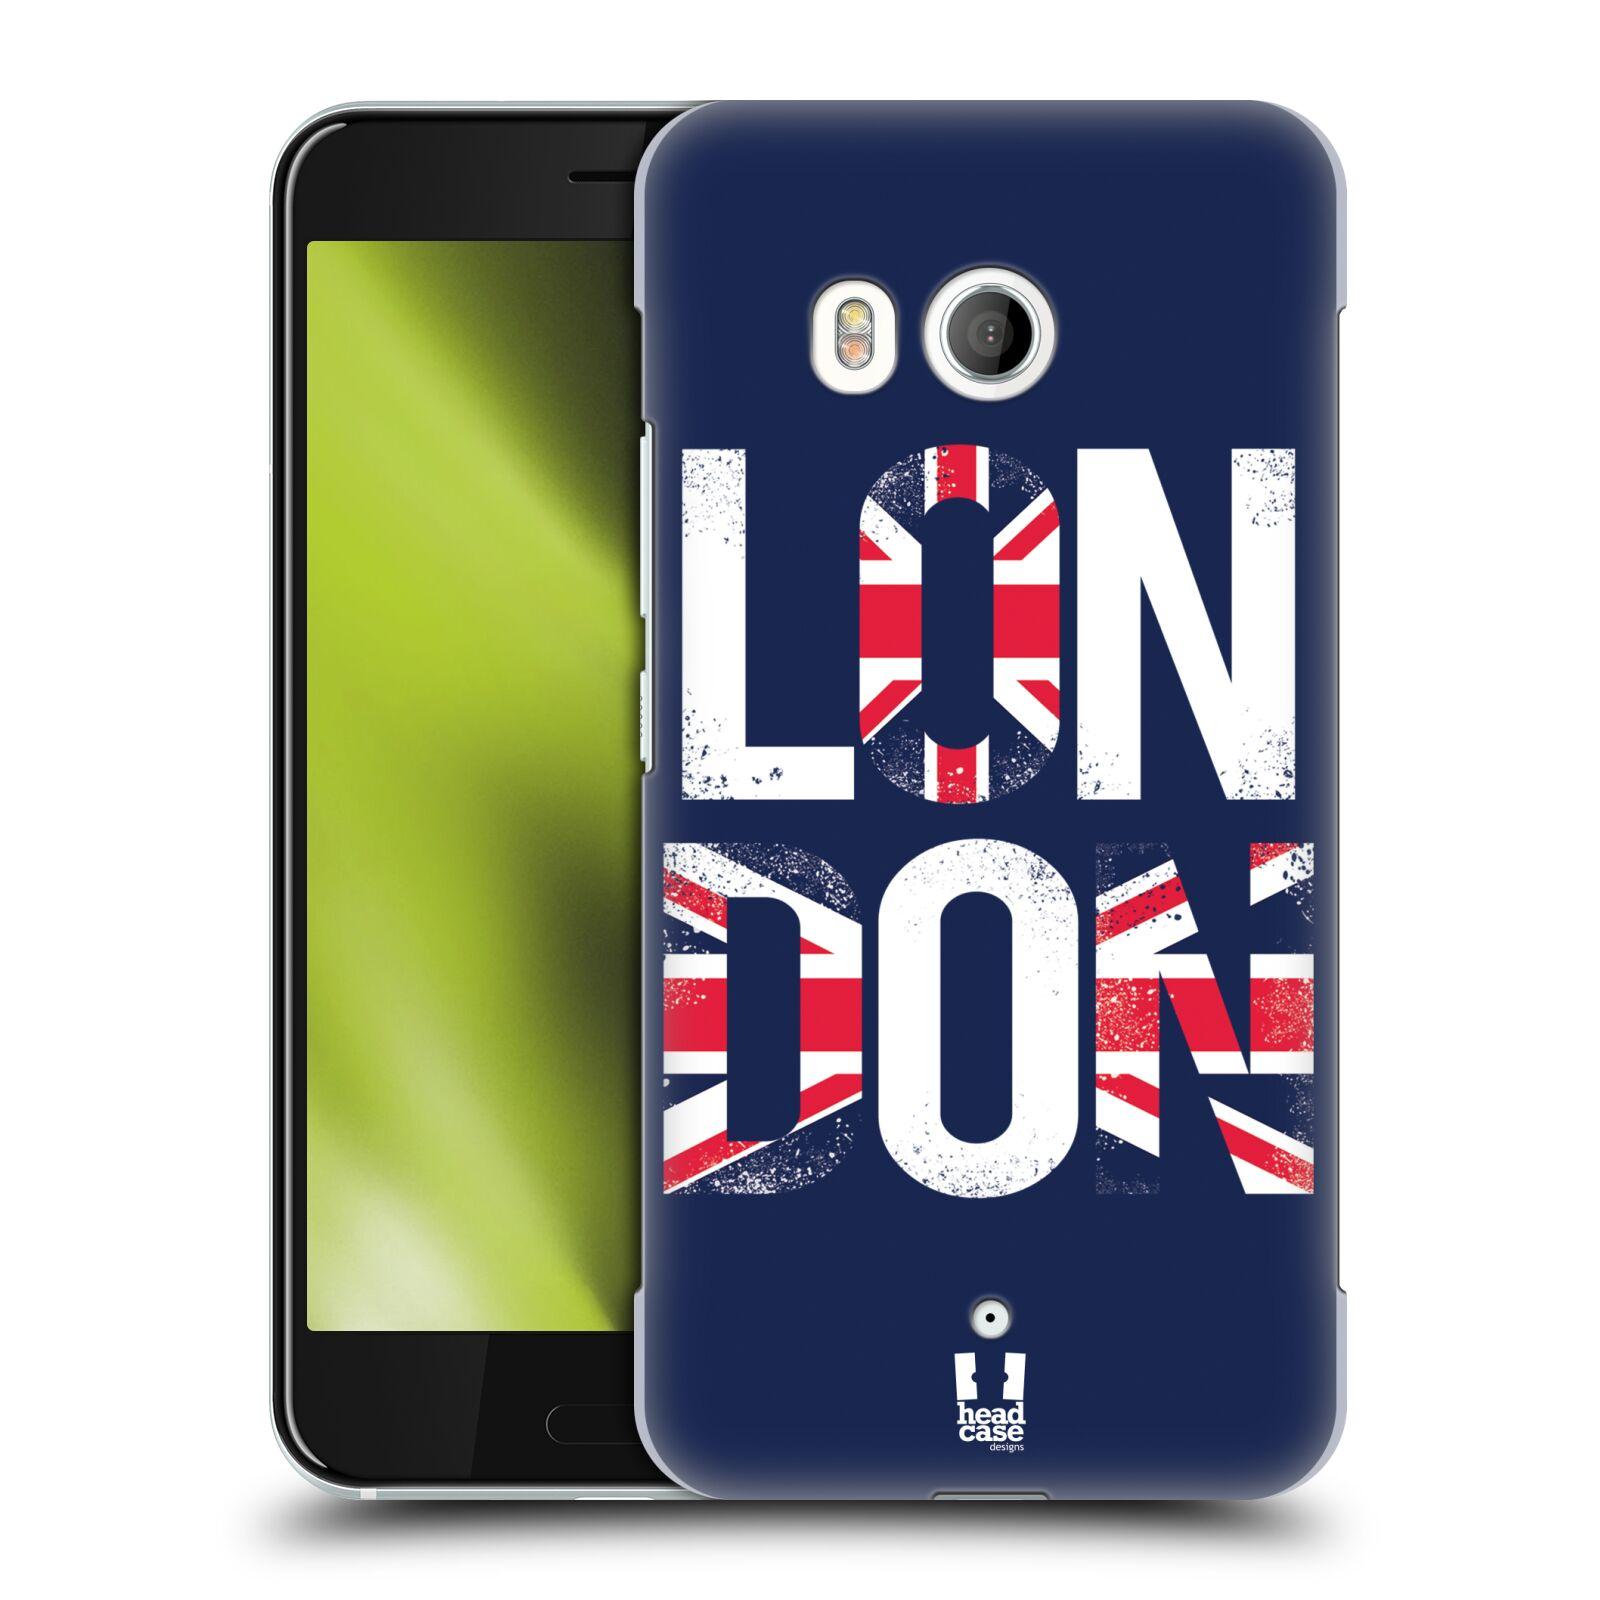 HEAD-CASE-DESIGNS-LONDON-PRINTS-HARD-BACK-CASE-FOR-HTC-U11-DUAL